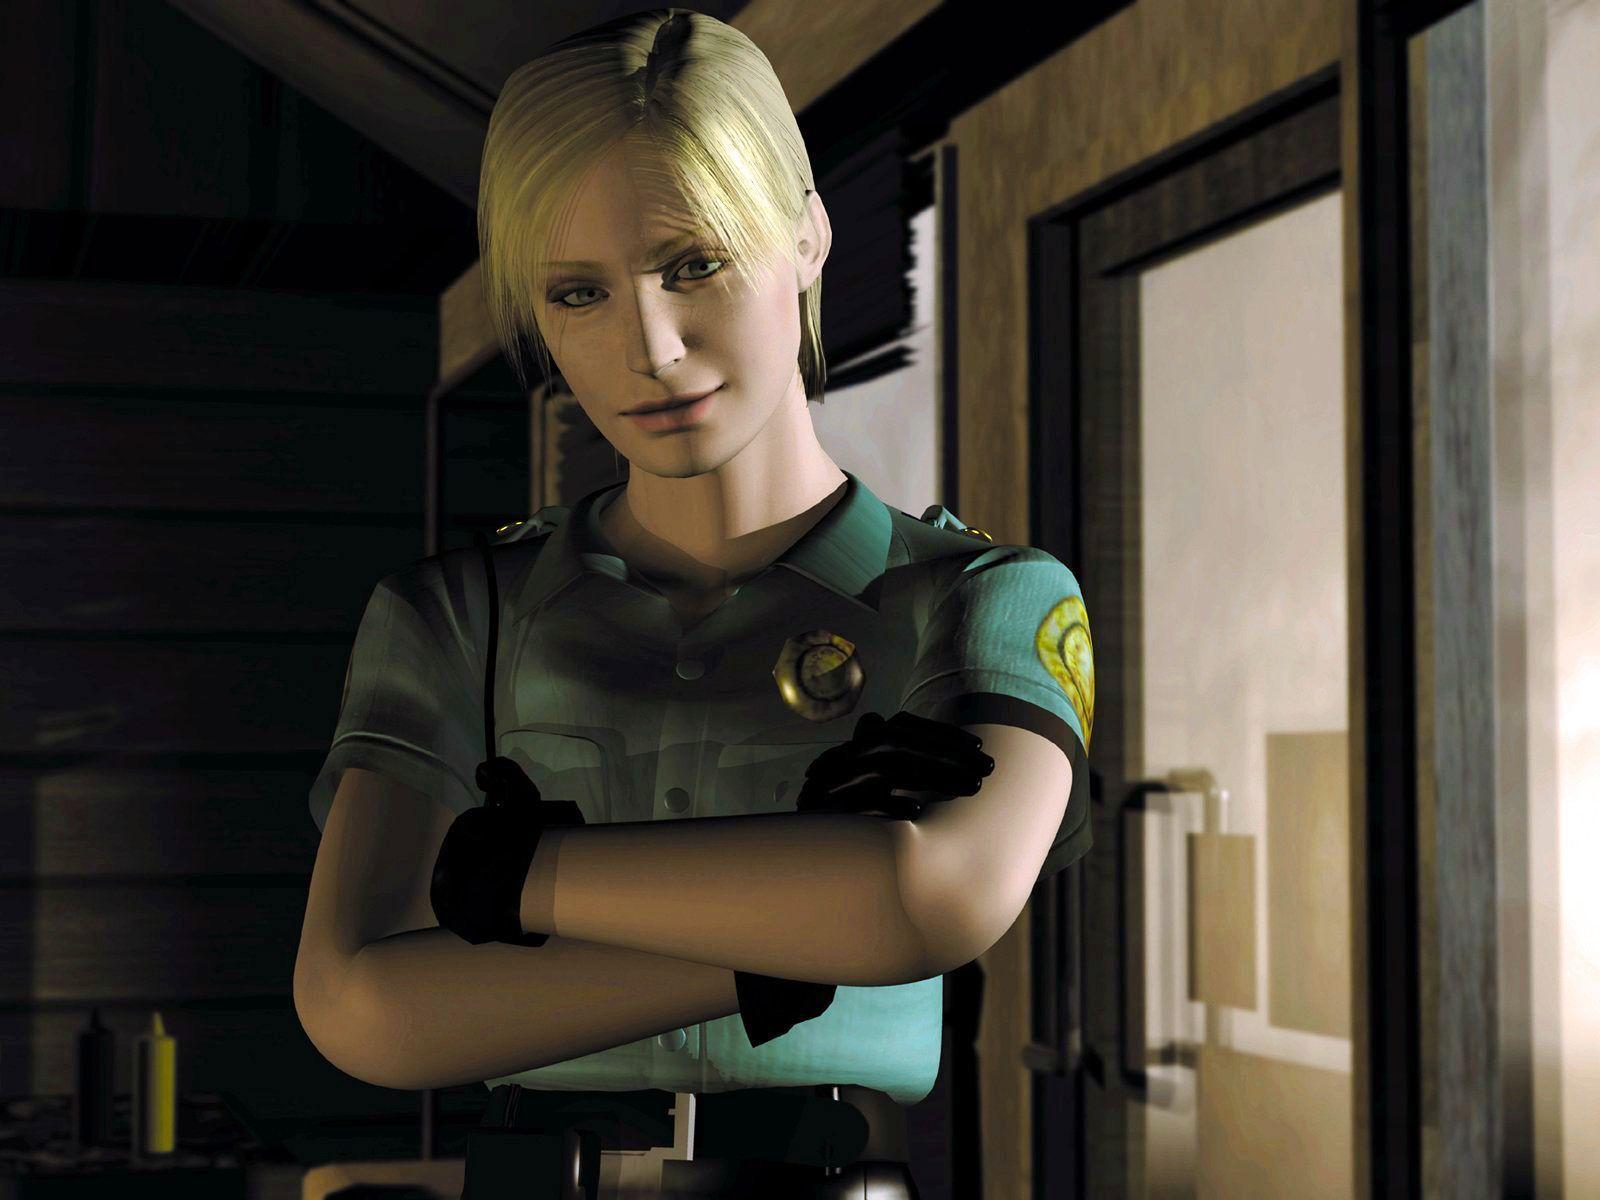 Otra fácil: Cybil Bennett, un personaje de Silent Hill, ¿es una oficial de donde?